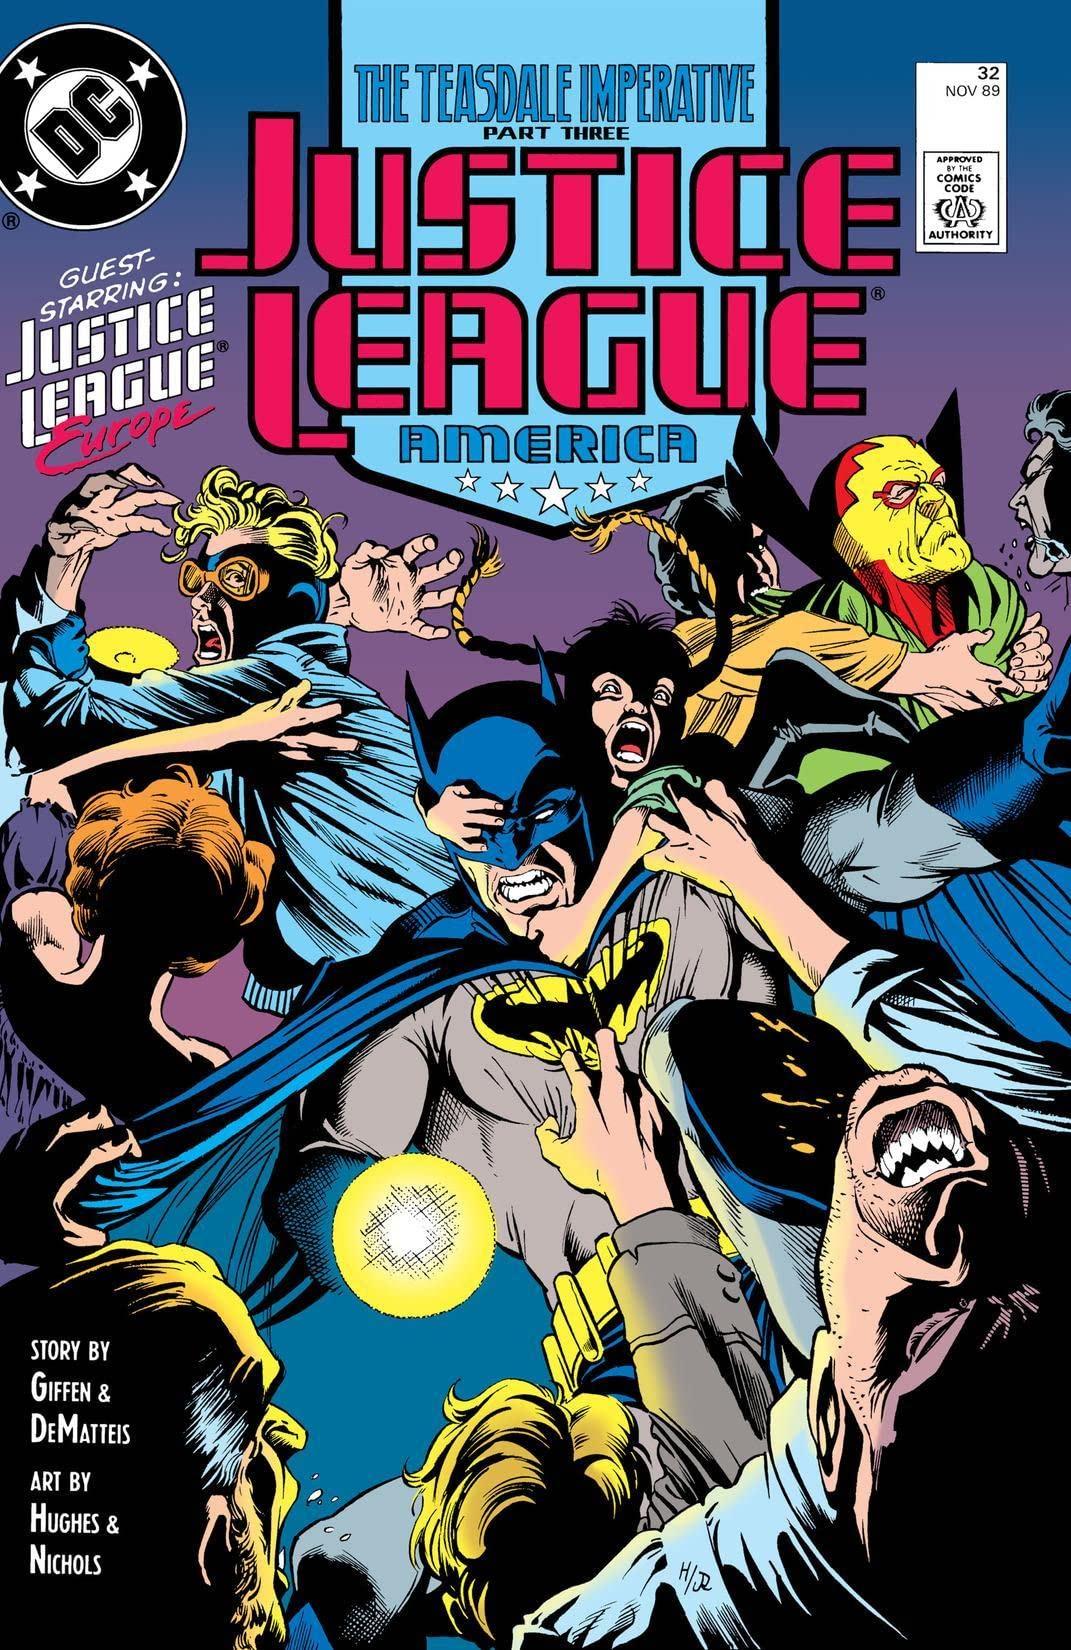 Justice League America #32 cover by Adam Hughes & Joe Rubinstein